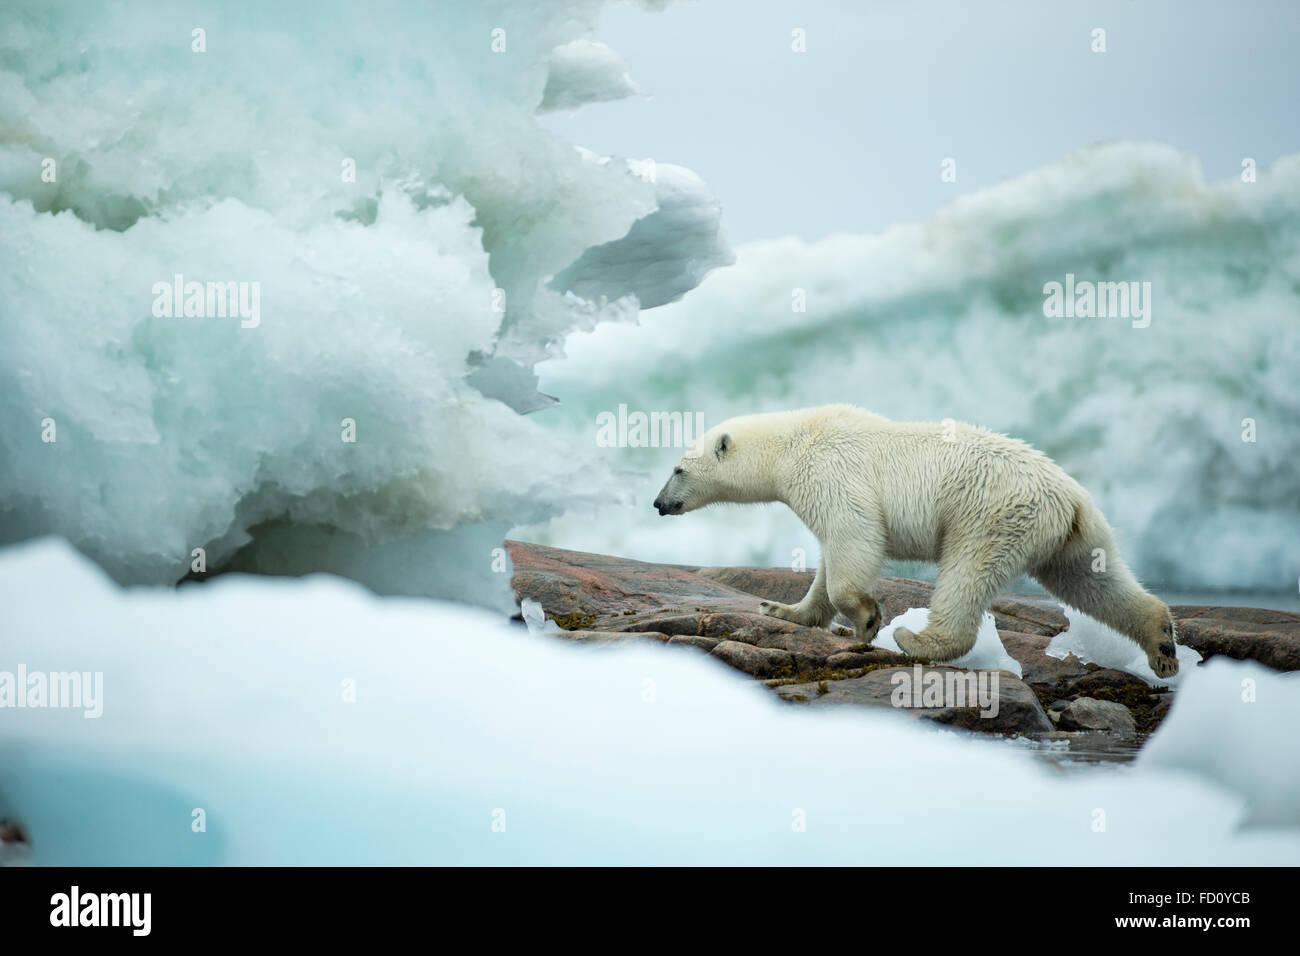 Canada, Nunavut Territory, Repulse Bay, Polar Bear (Ursus maritimus) walking amid melting sea ice near Harbour Islands - Stock Image